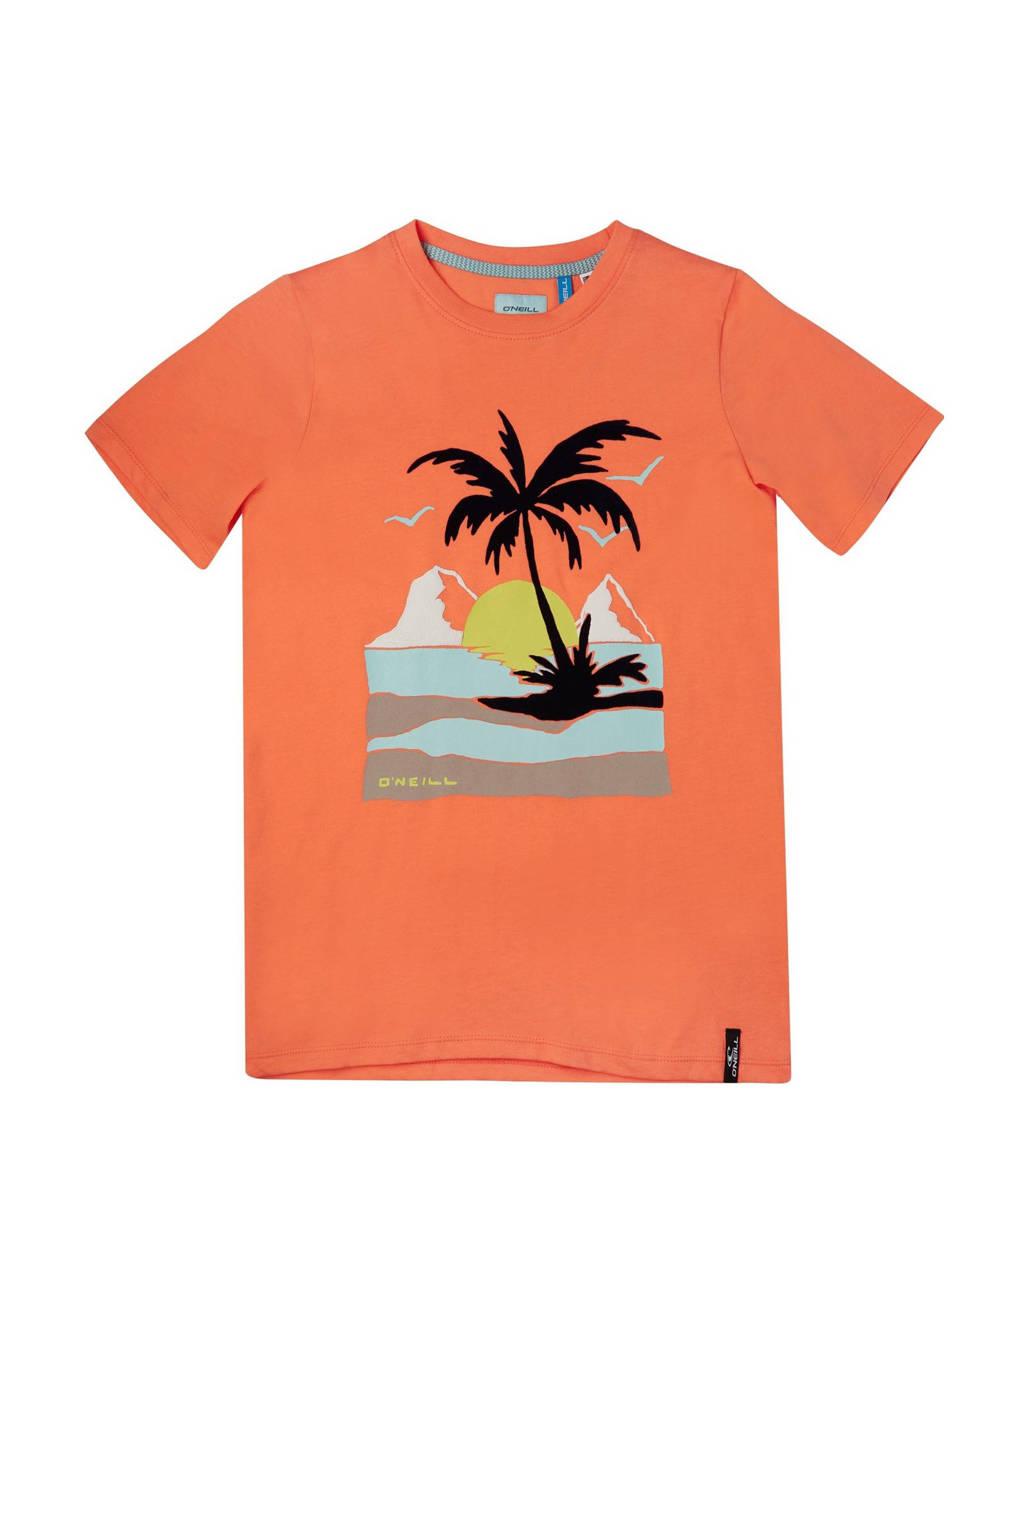 O'Neill Blue T-shirt Palm met printopdruk oranje, Oranje